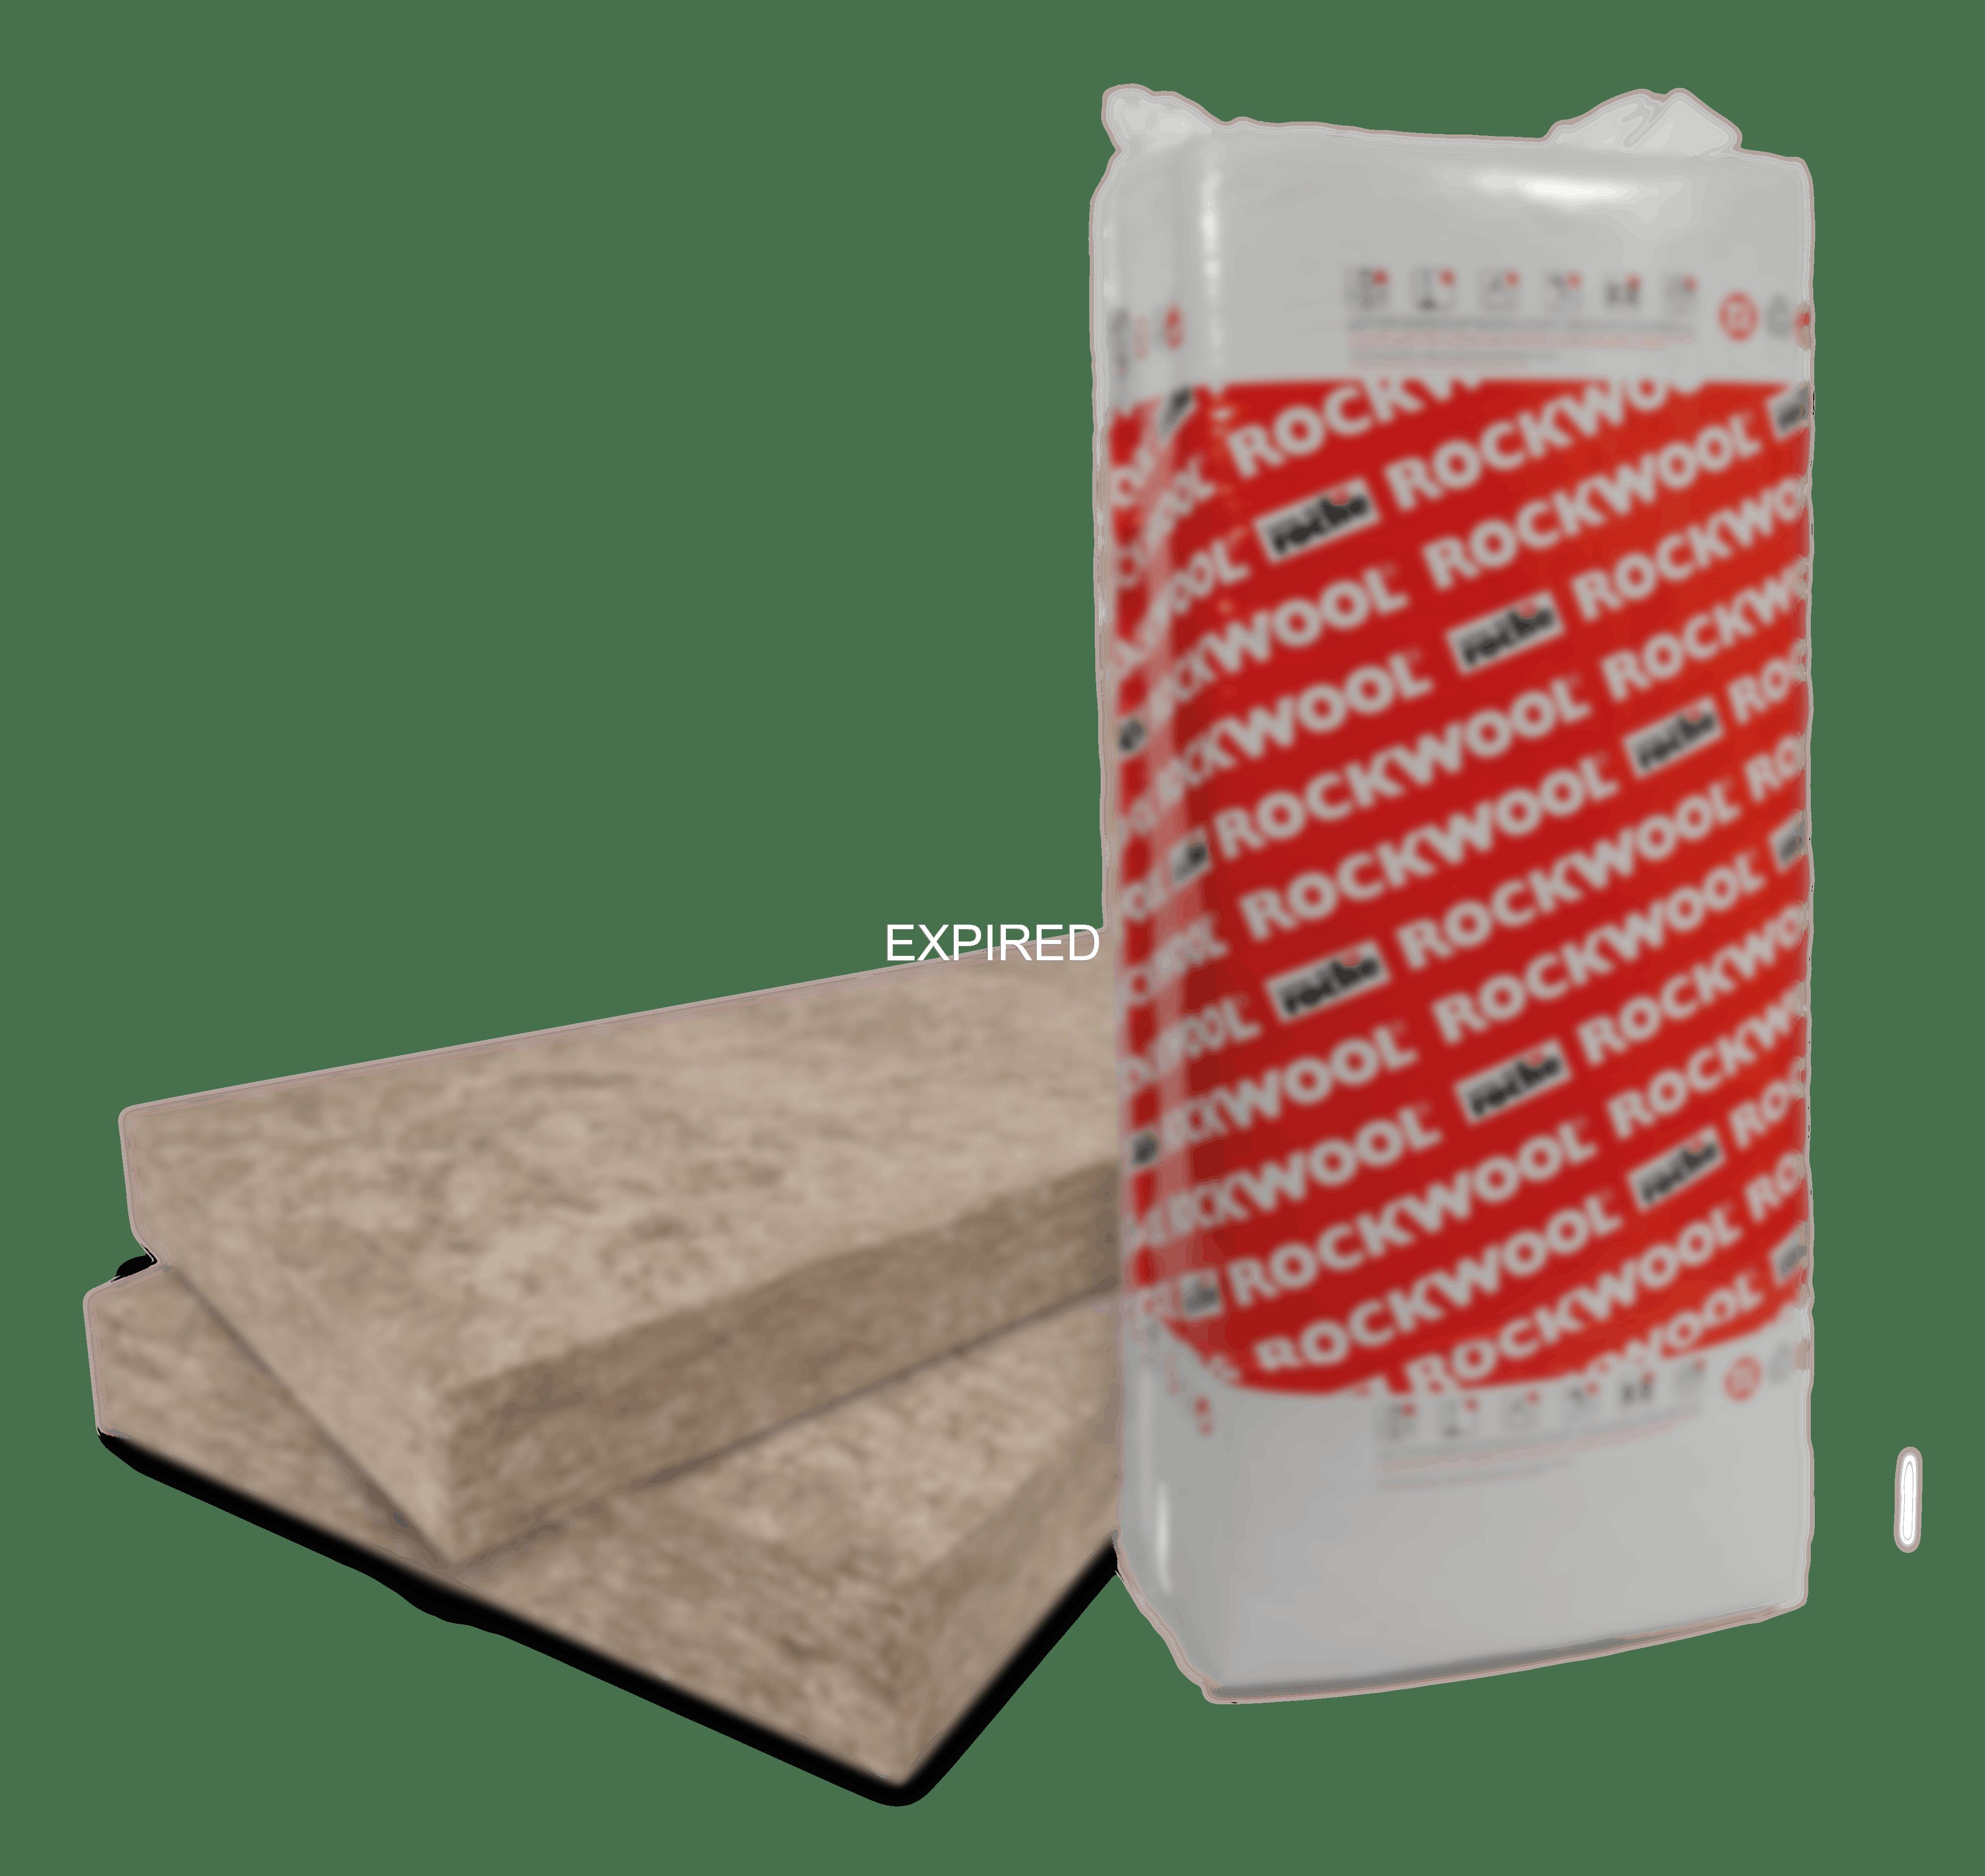 Rockplus nu, packaging, produit, product, png